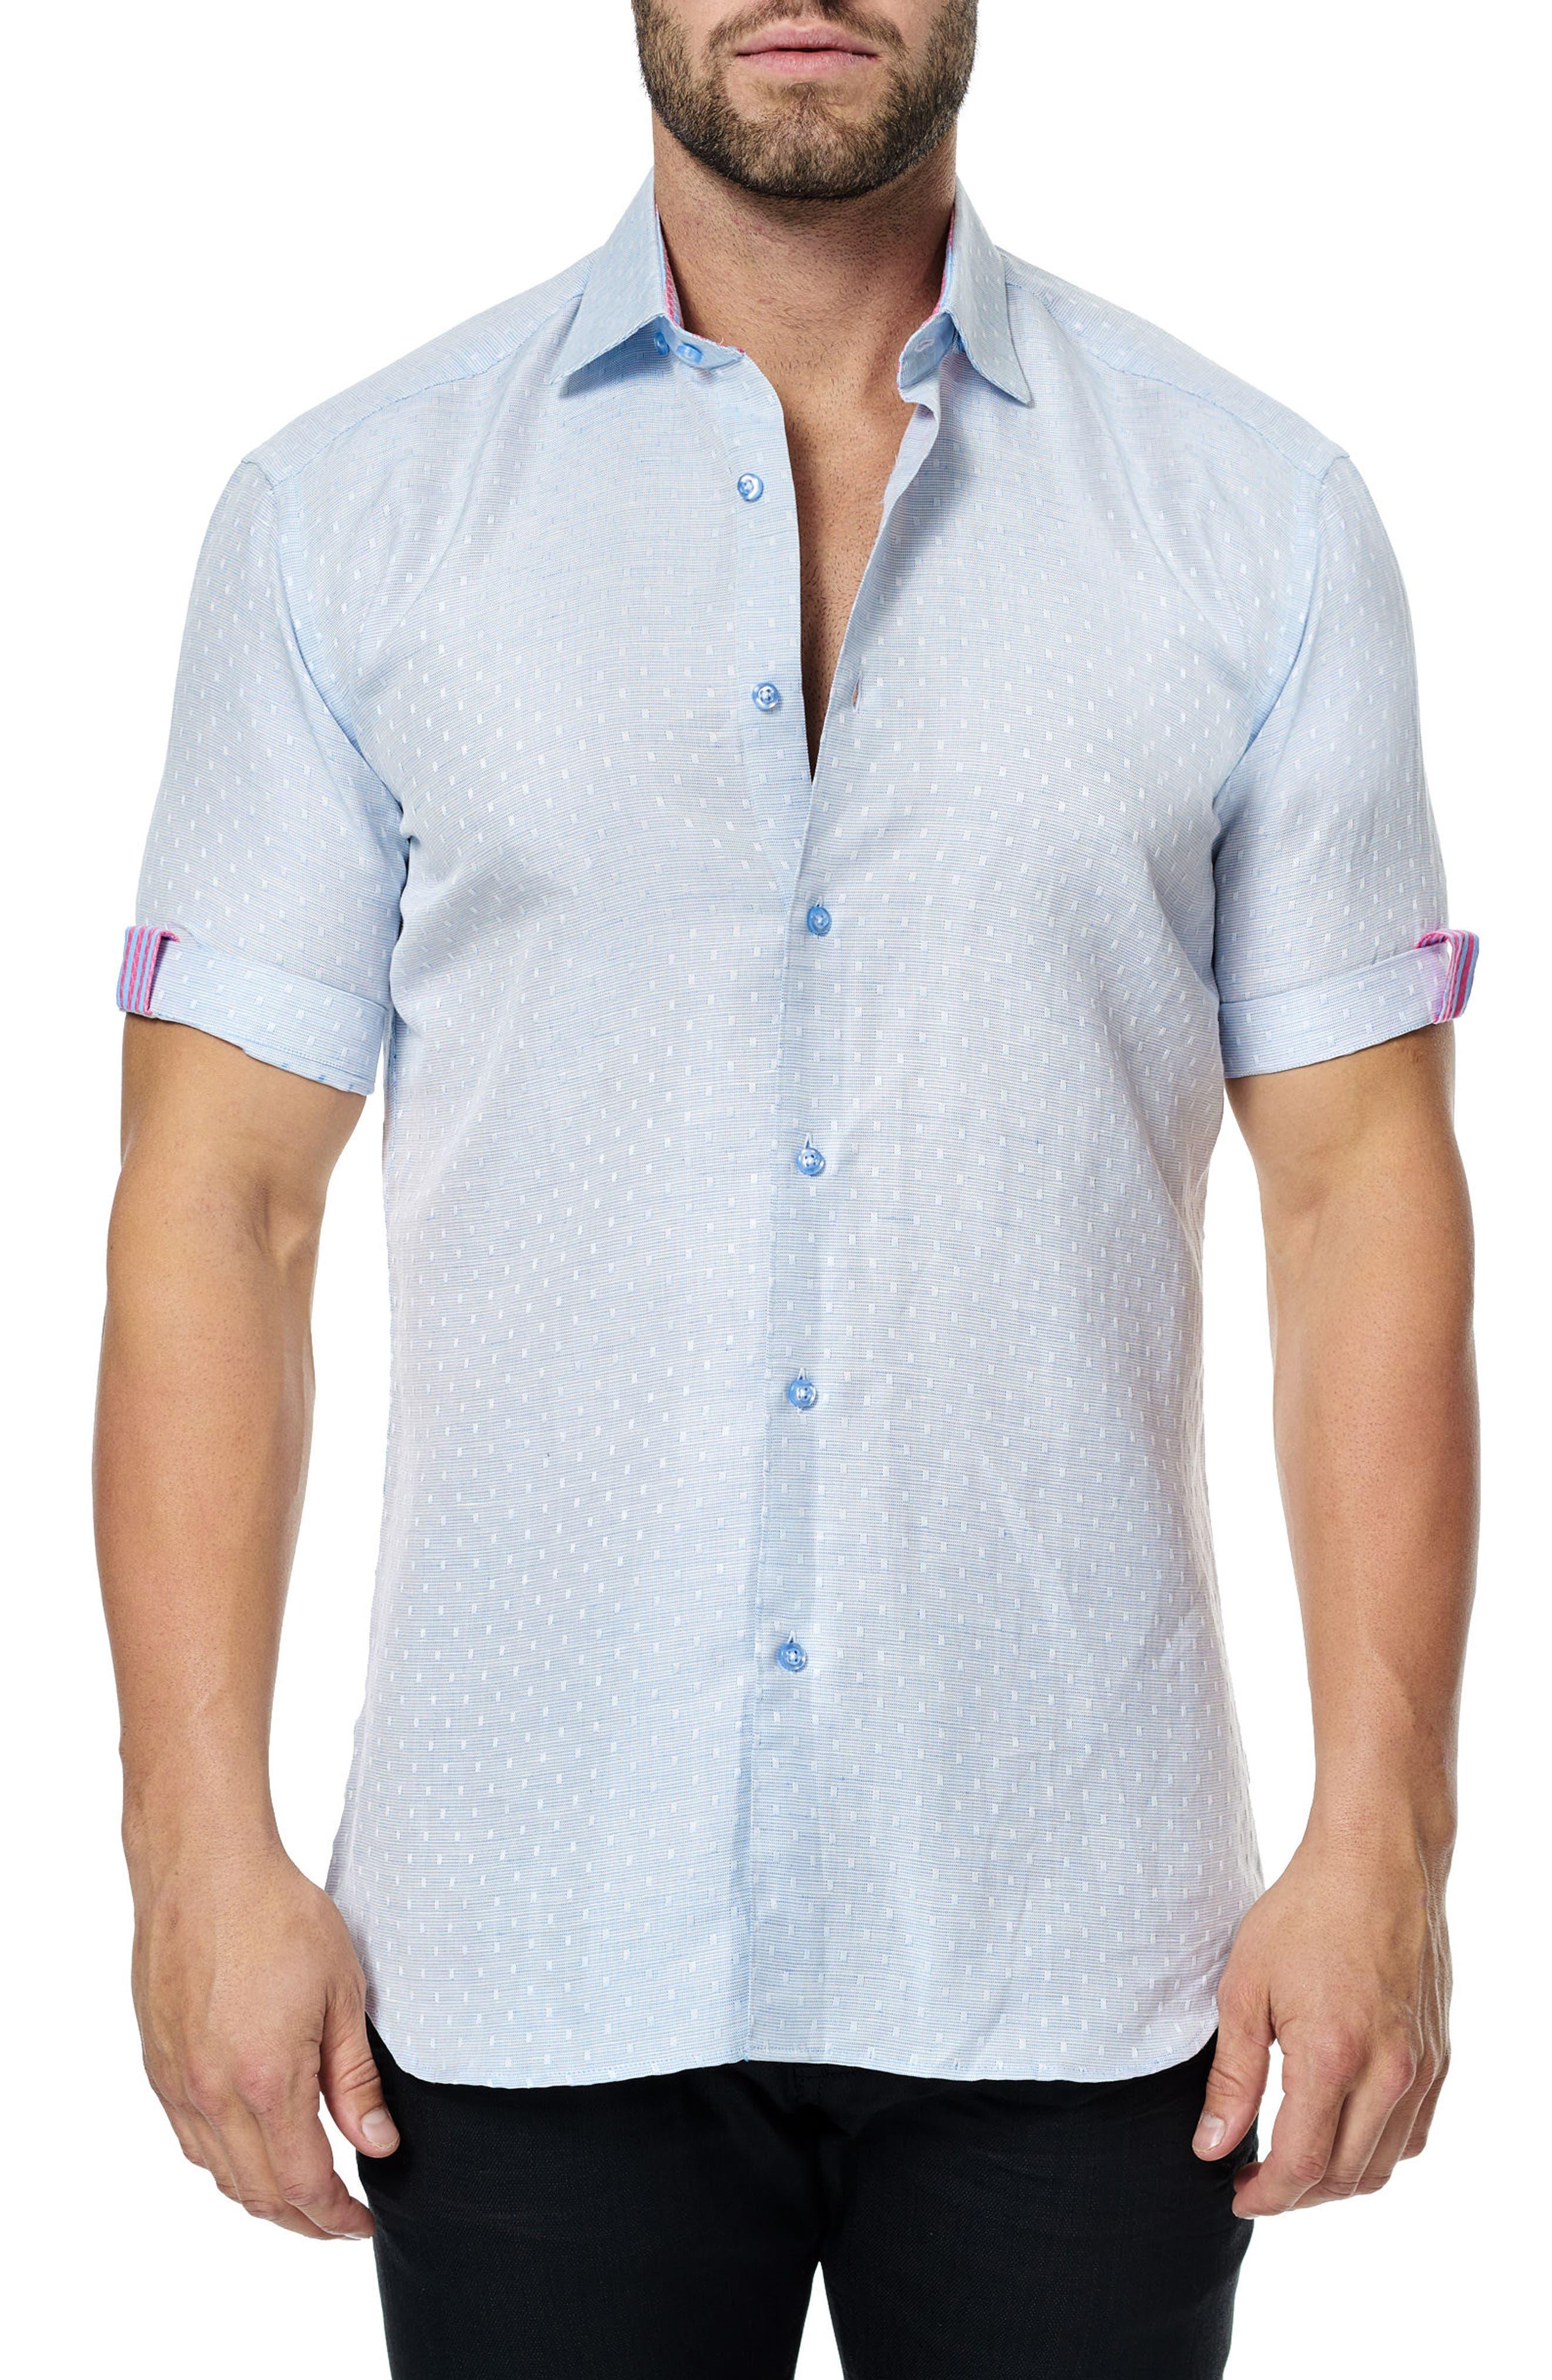 Alternate Image 1 Selected - Maceoo Fresh Jacquard Sport Shirt